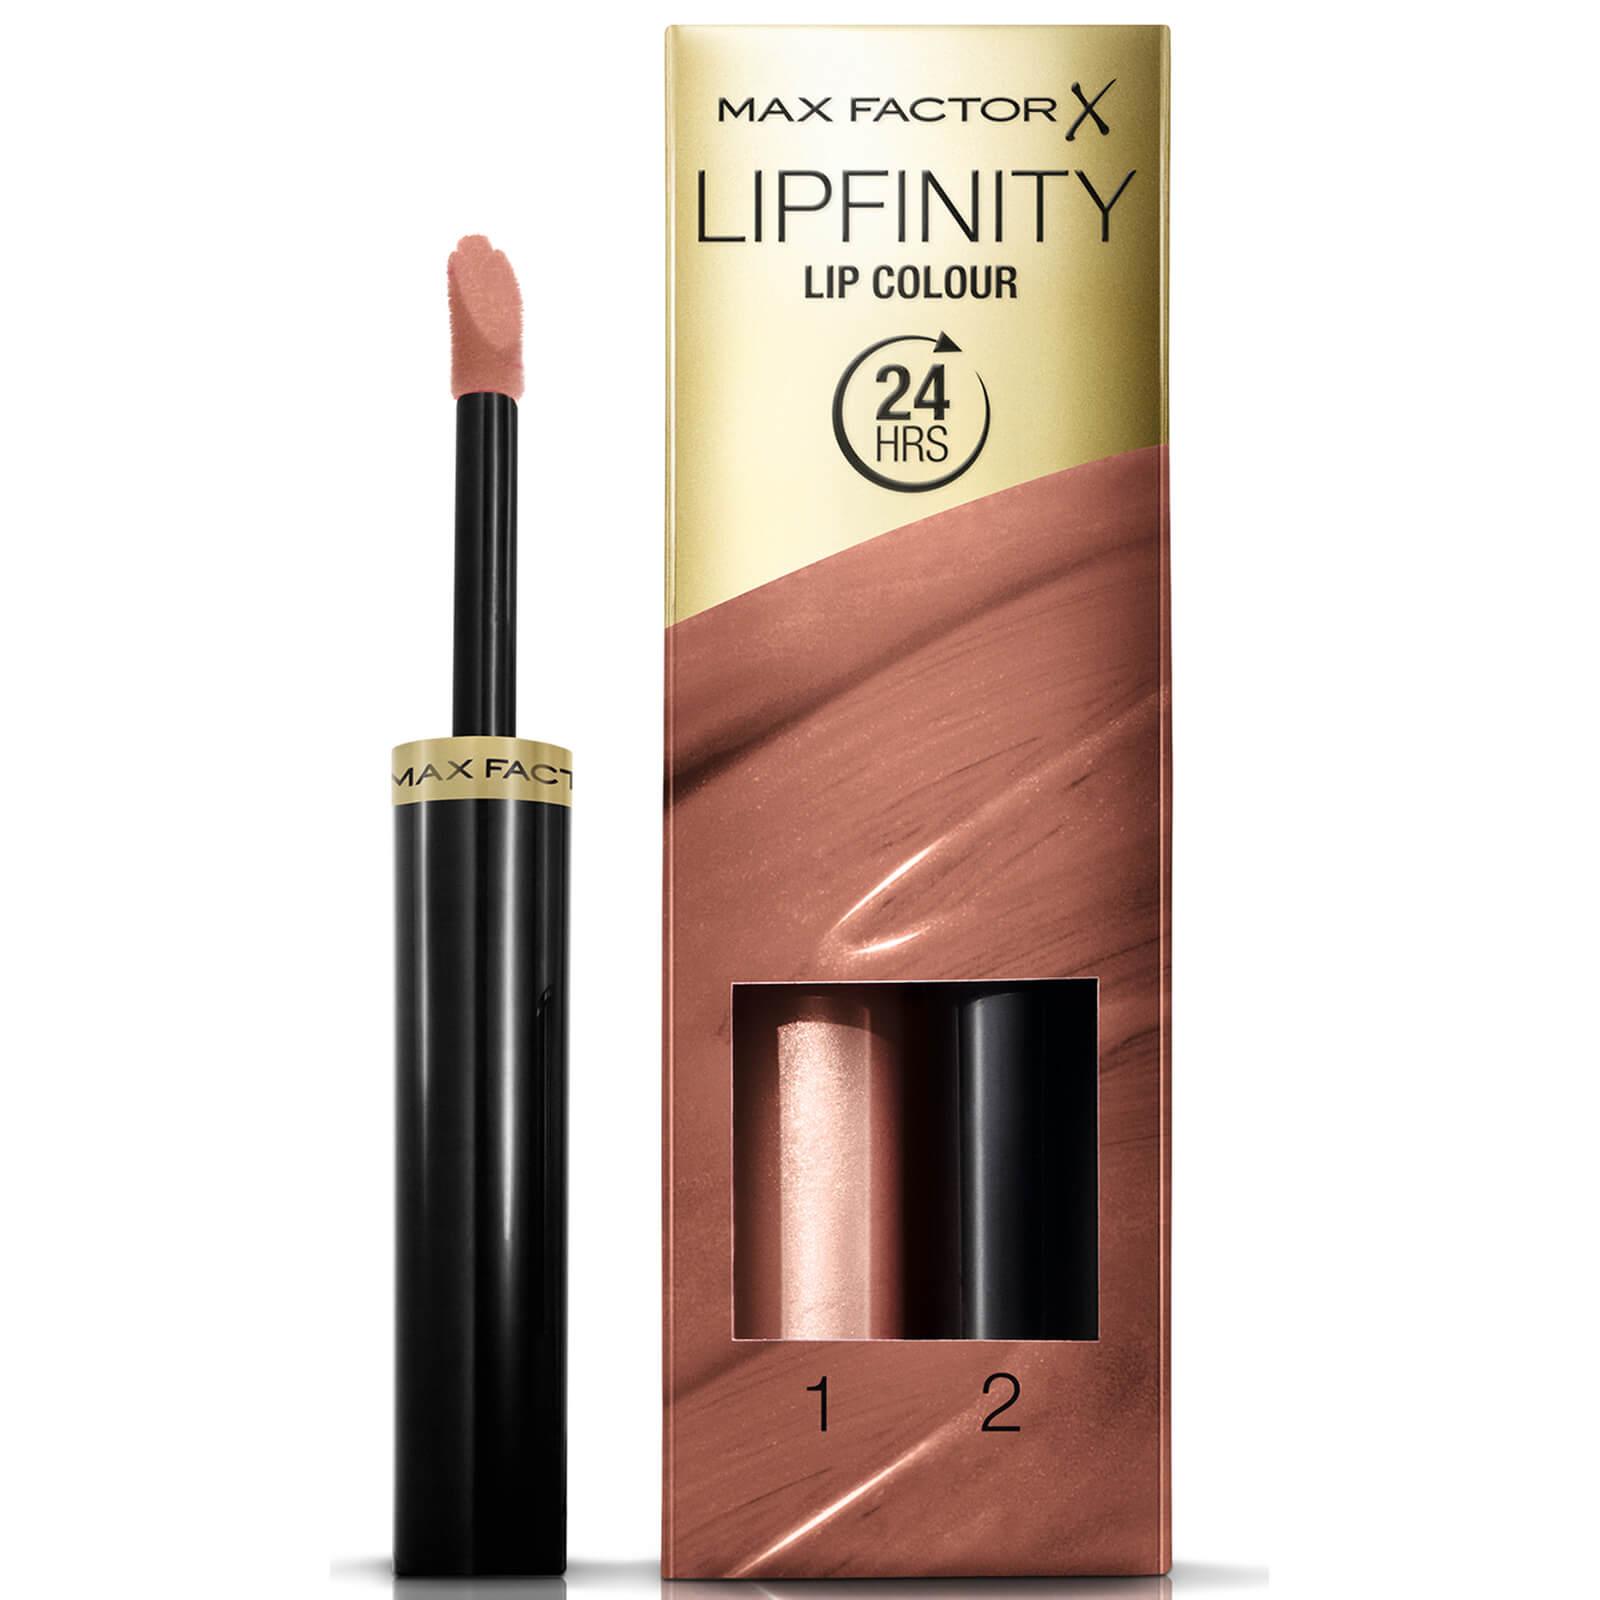 bd488d7e603 Max Factor Lipfinity Lip Color 3.69g - 180 Spiritual | Free Shipping |  Lookfantastic